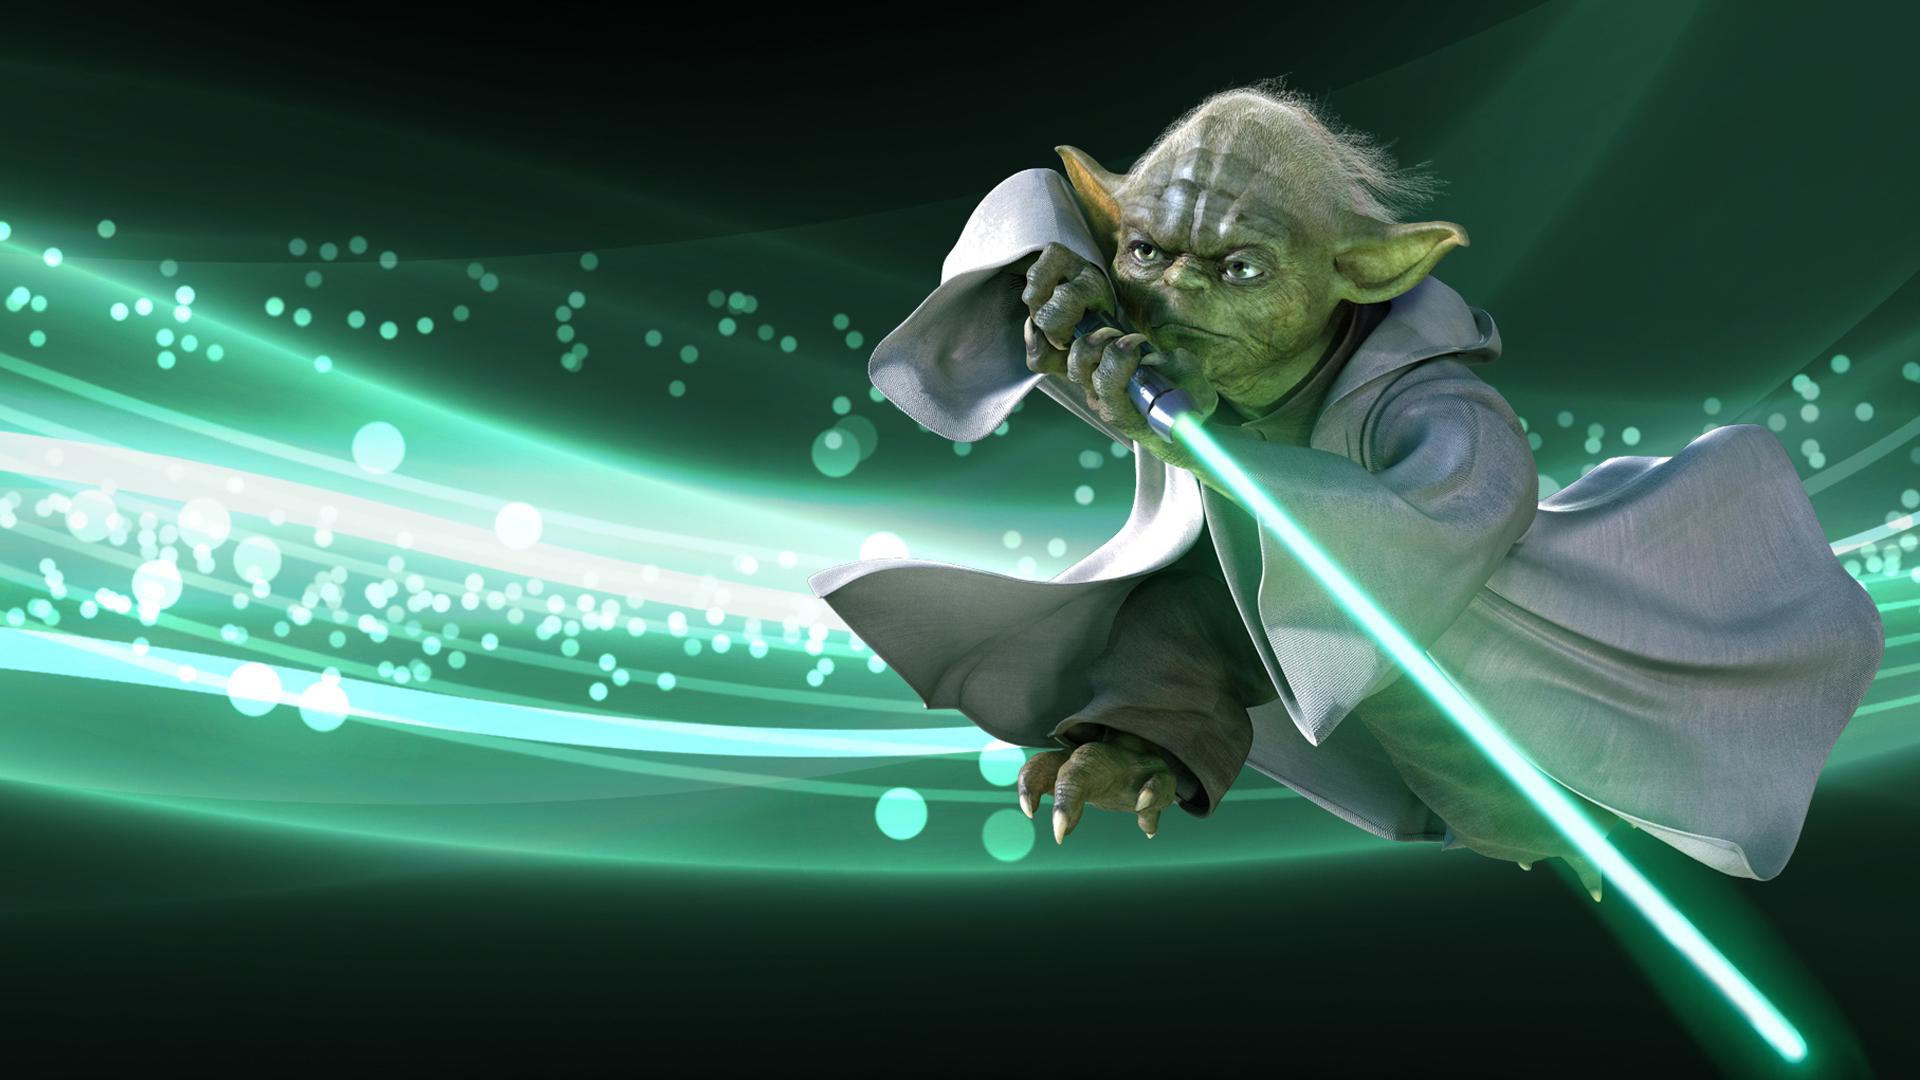 yoda star wars hd wallpaper, background images